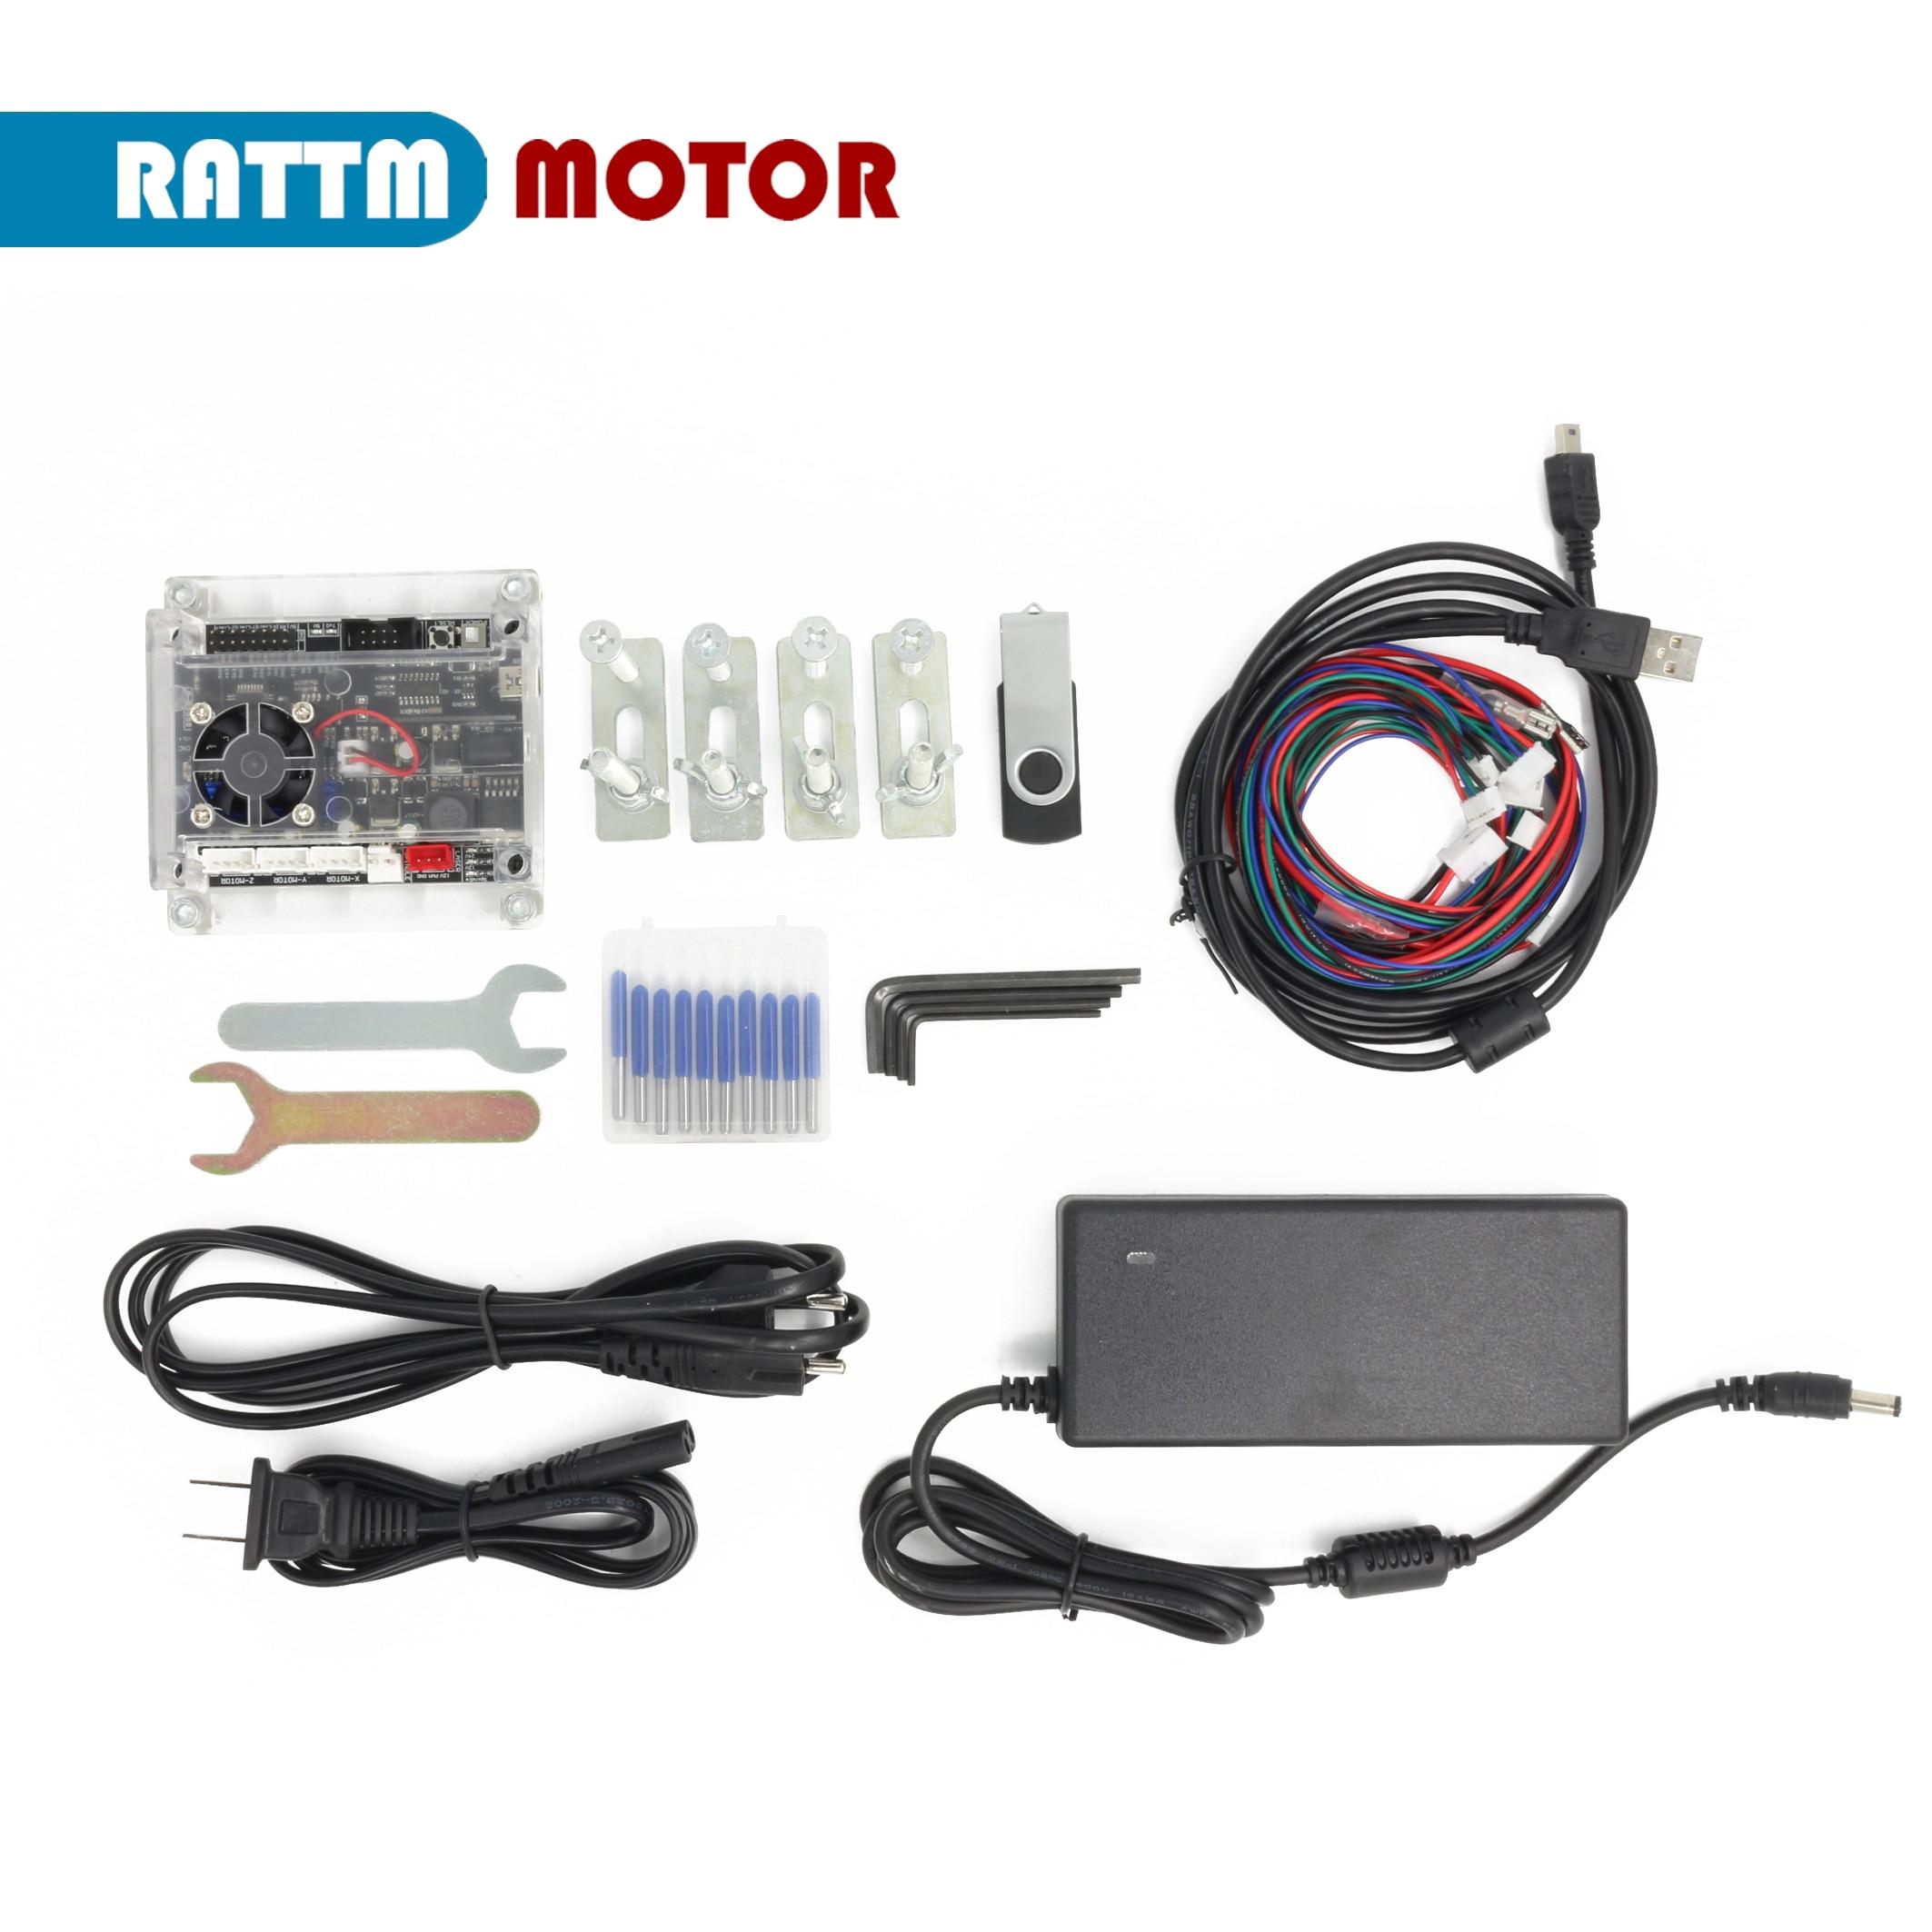 【RU / EU】CNC 3 Axis GRBL Control 3018 Pro Max DIY Mini Laser engraving Machine + ER11 Collet enlarge